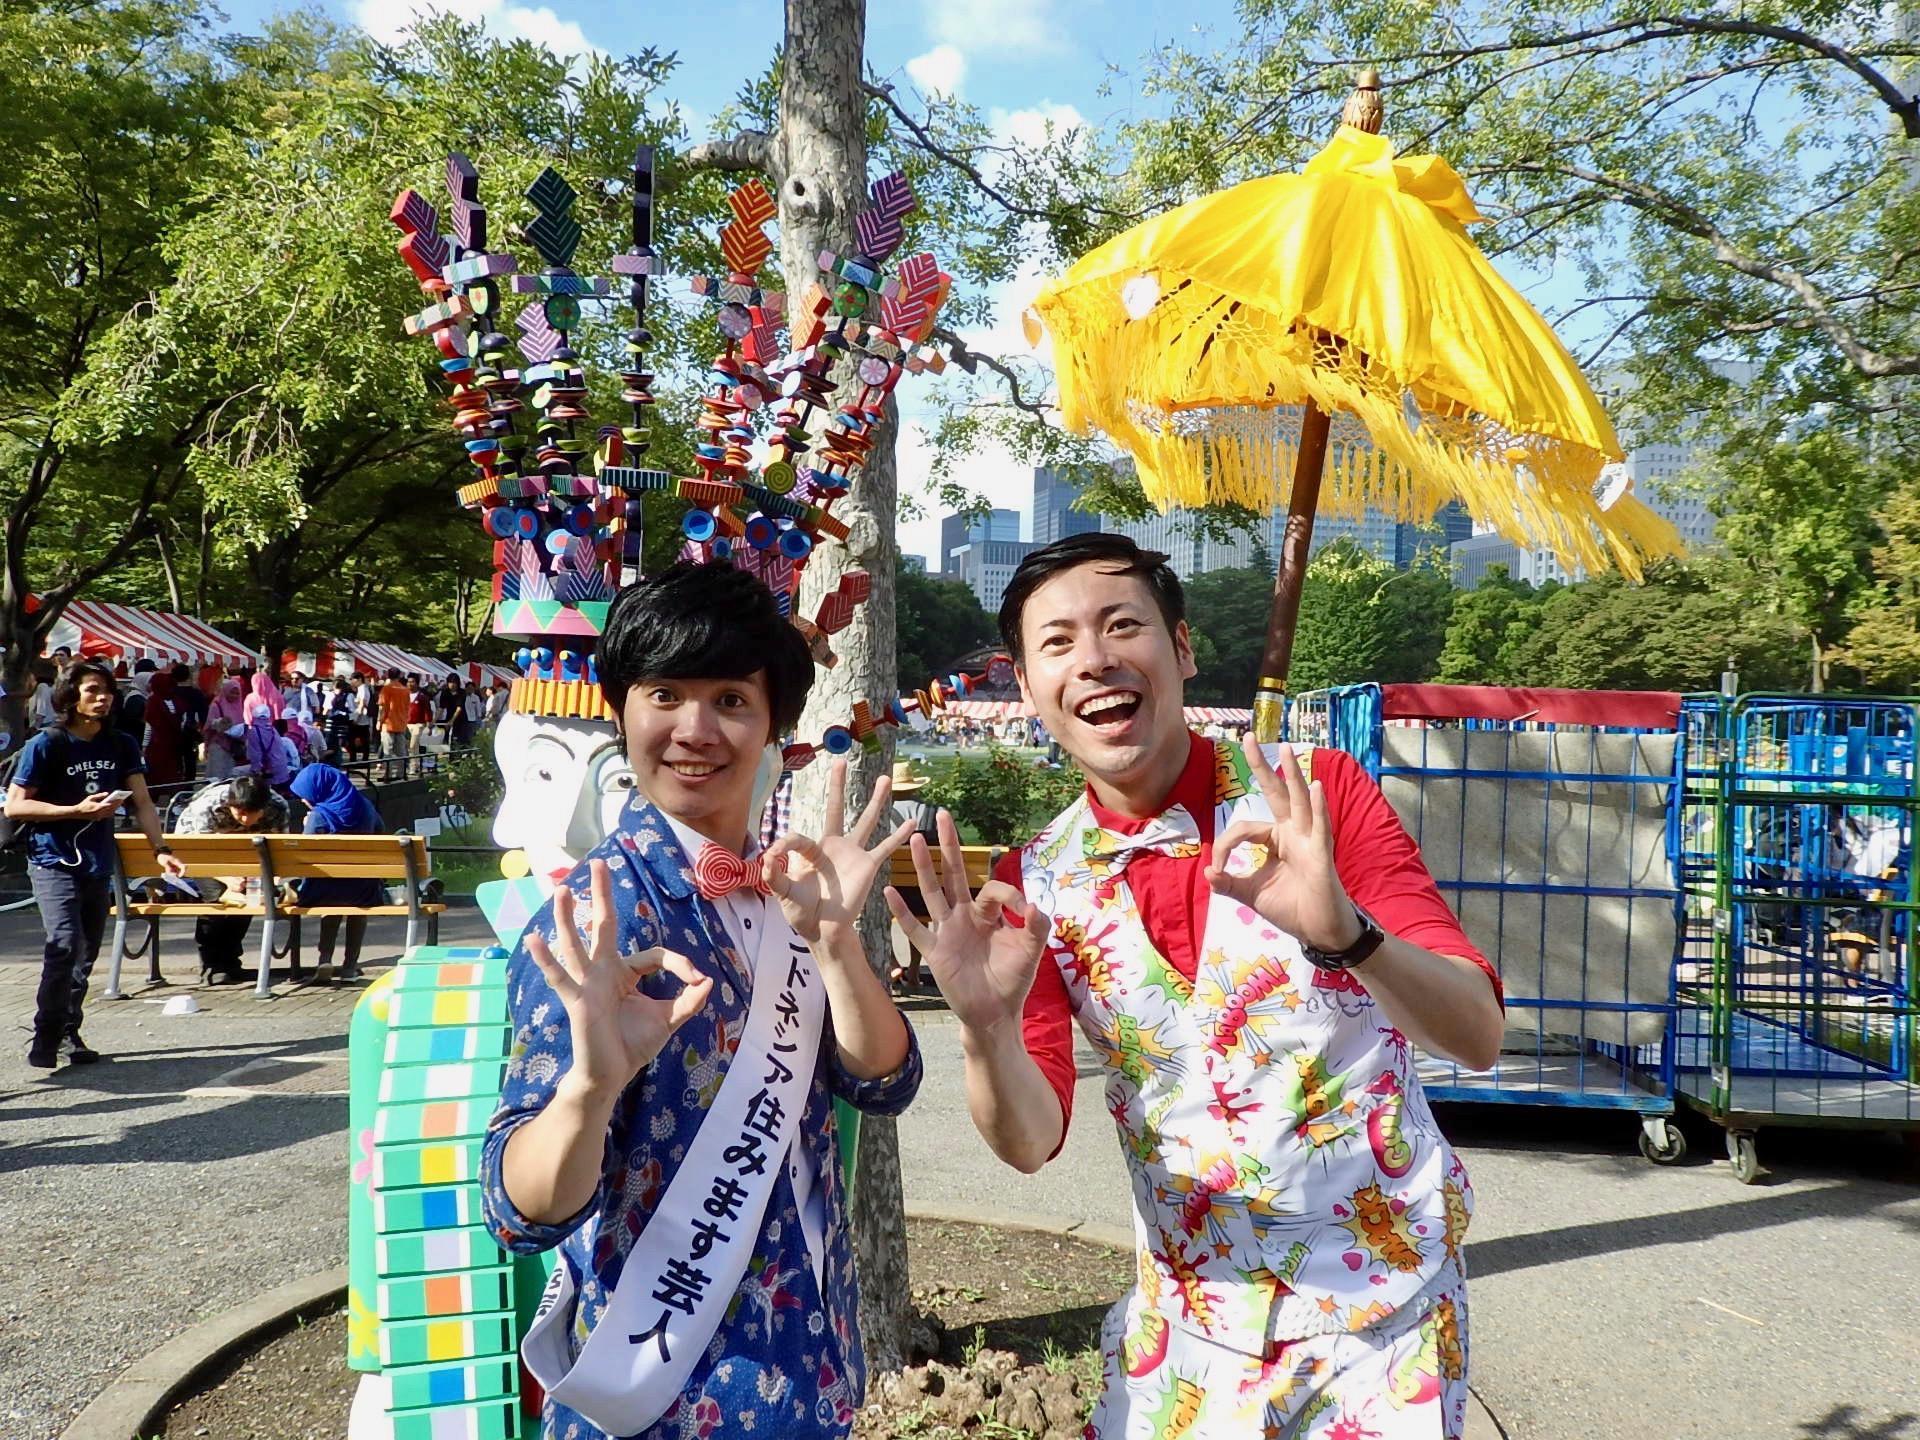 http://news.yoshimoto.co.jp/20180731170936-534478ac0d3cea17291e7c33dc1df55062324249.jpg